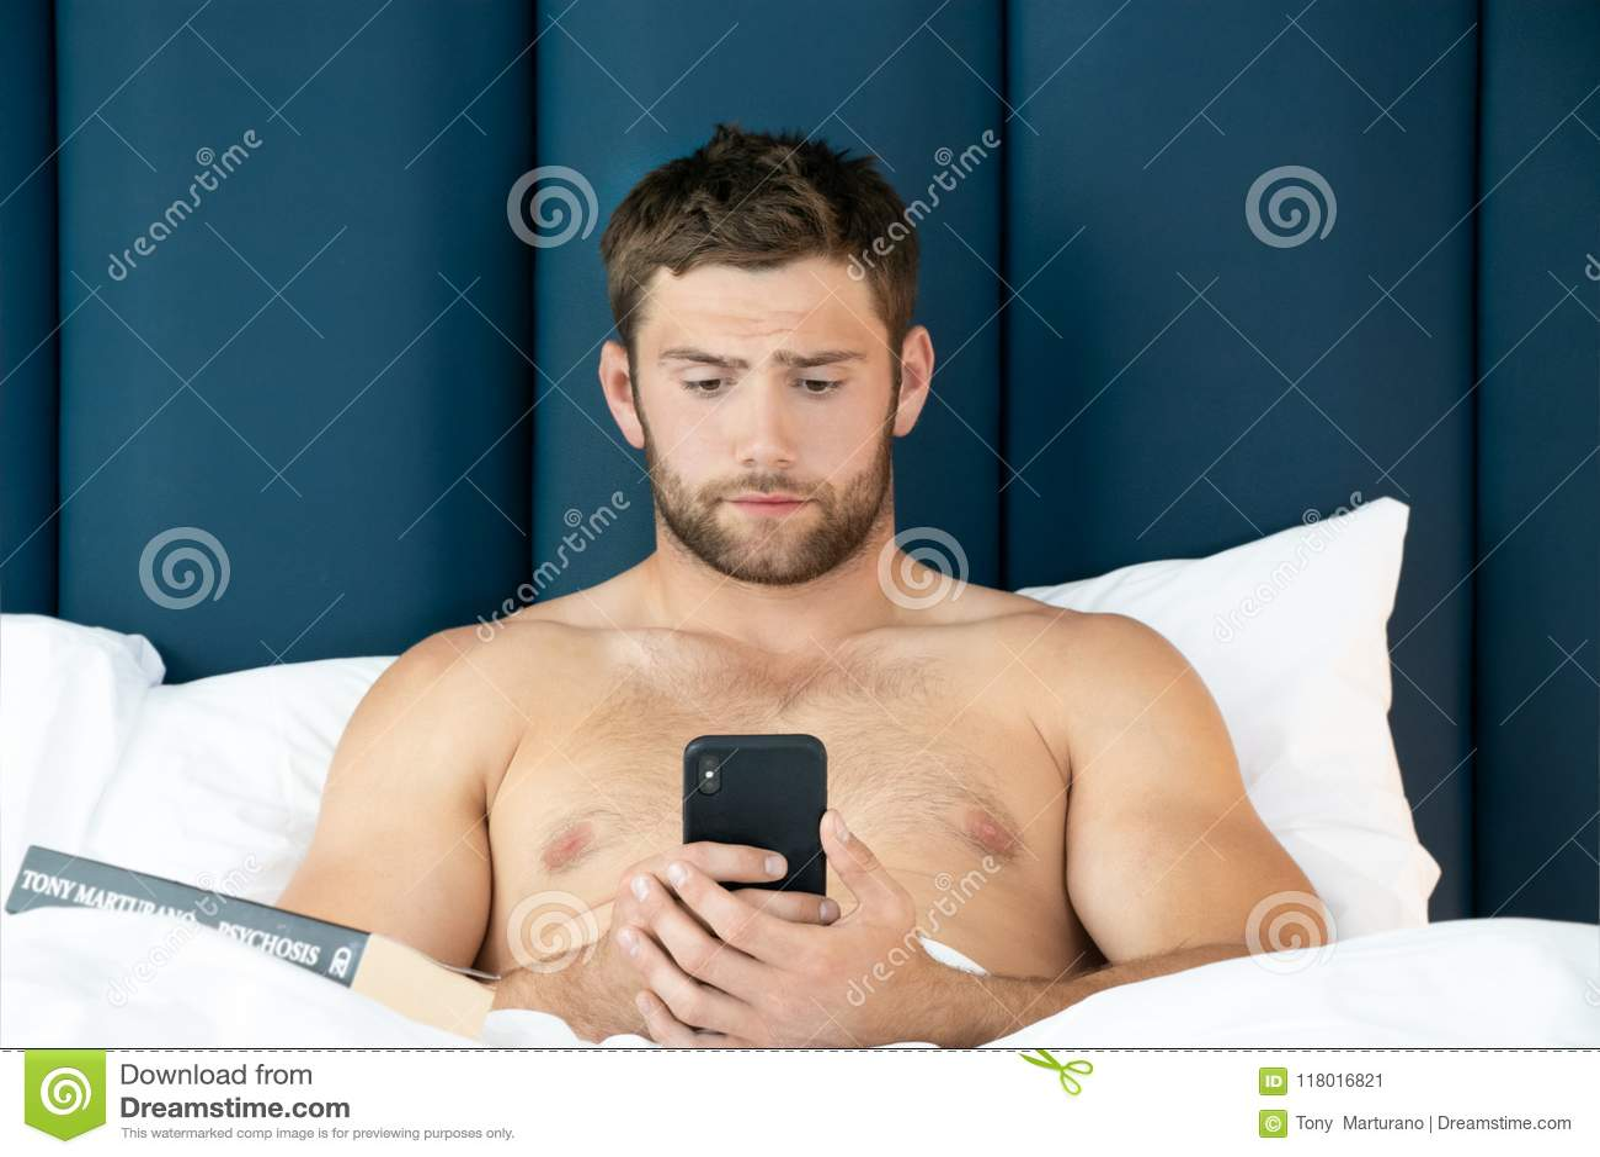 Porn hot girls free masturbating sexy nasty